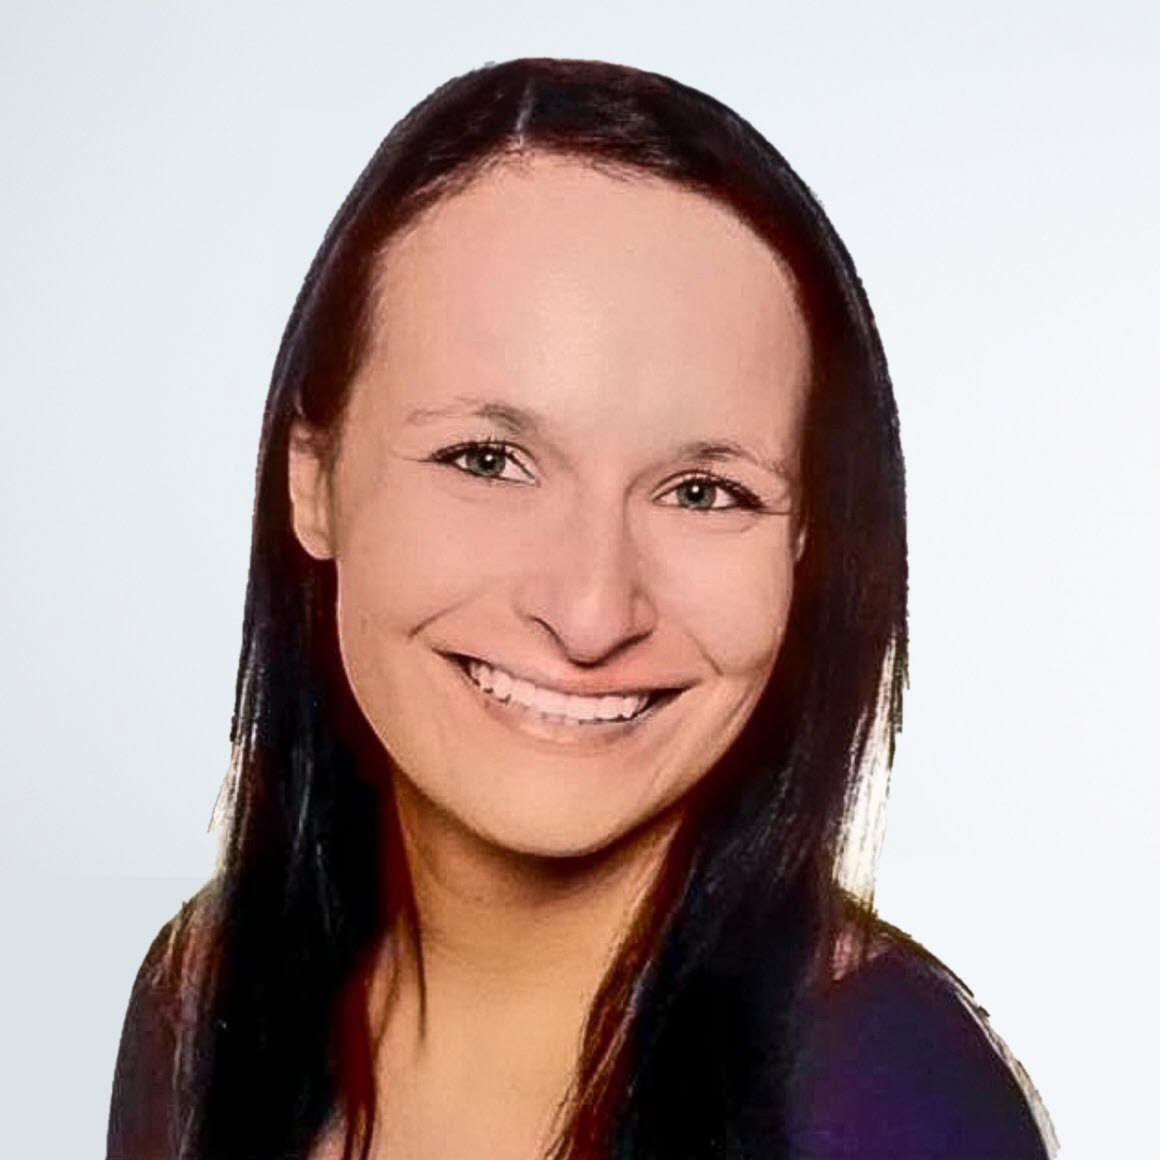 saskia-schulz-psmedia-social-media-performance-agentur-hamburg